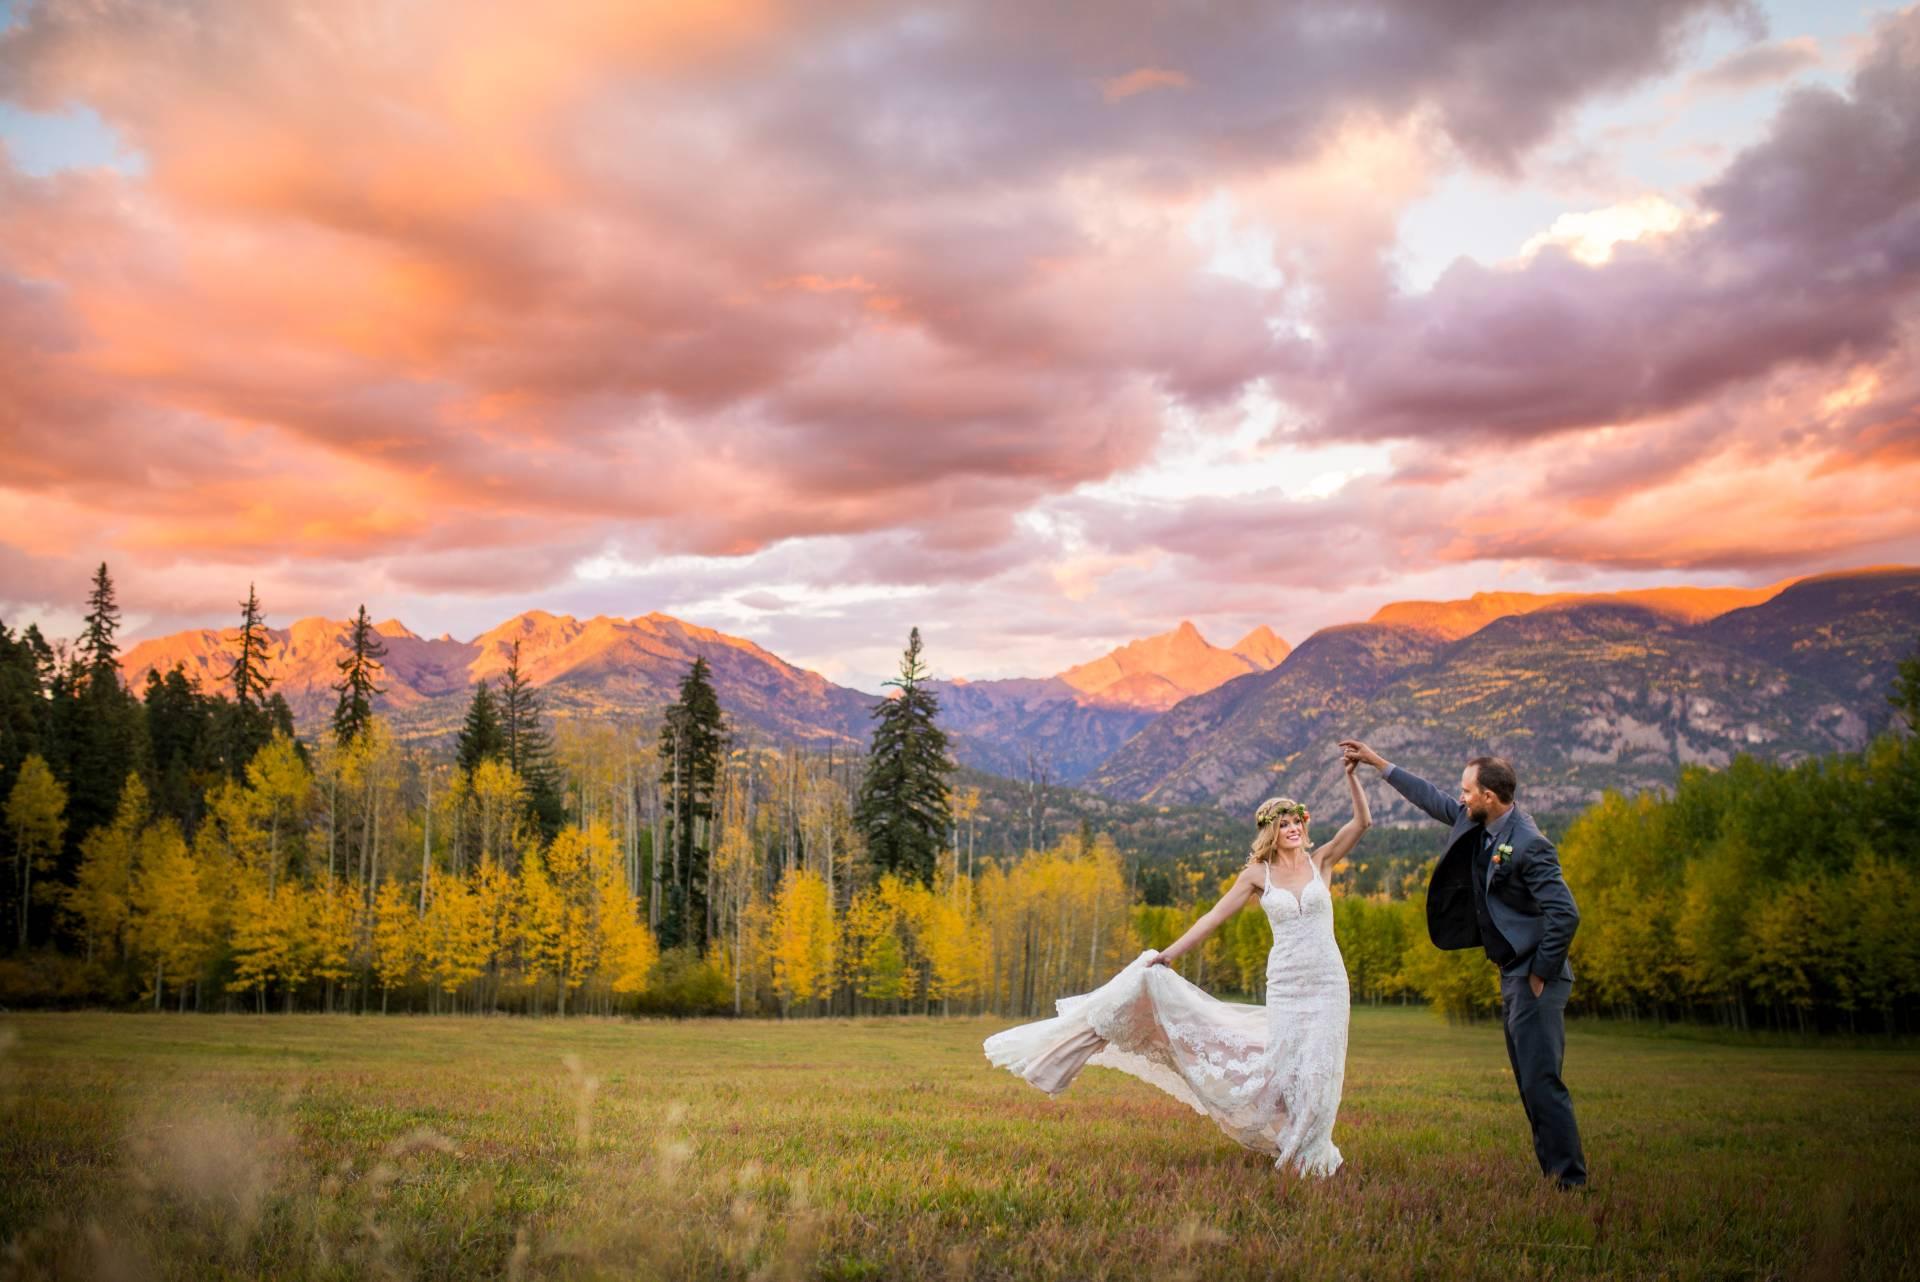 Colorado weddings engagements and adventure photography colorado adventure wedding colorado wedding photographers junglespirit Images